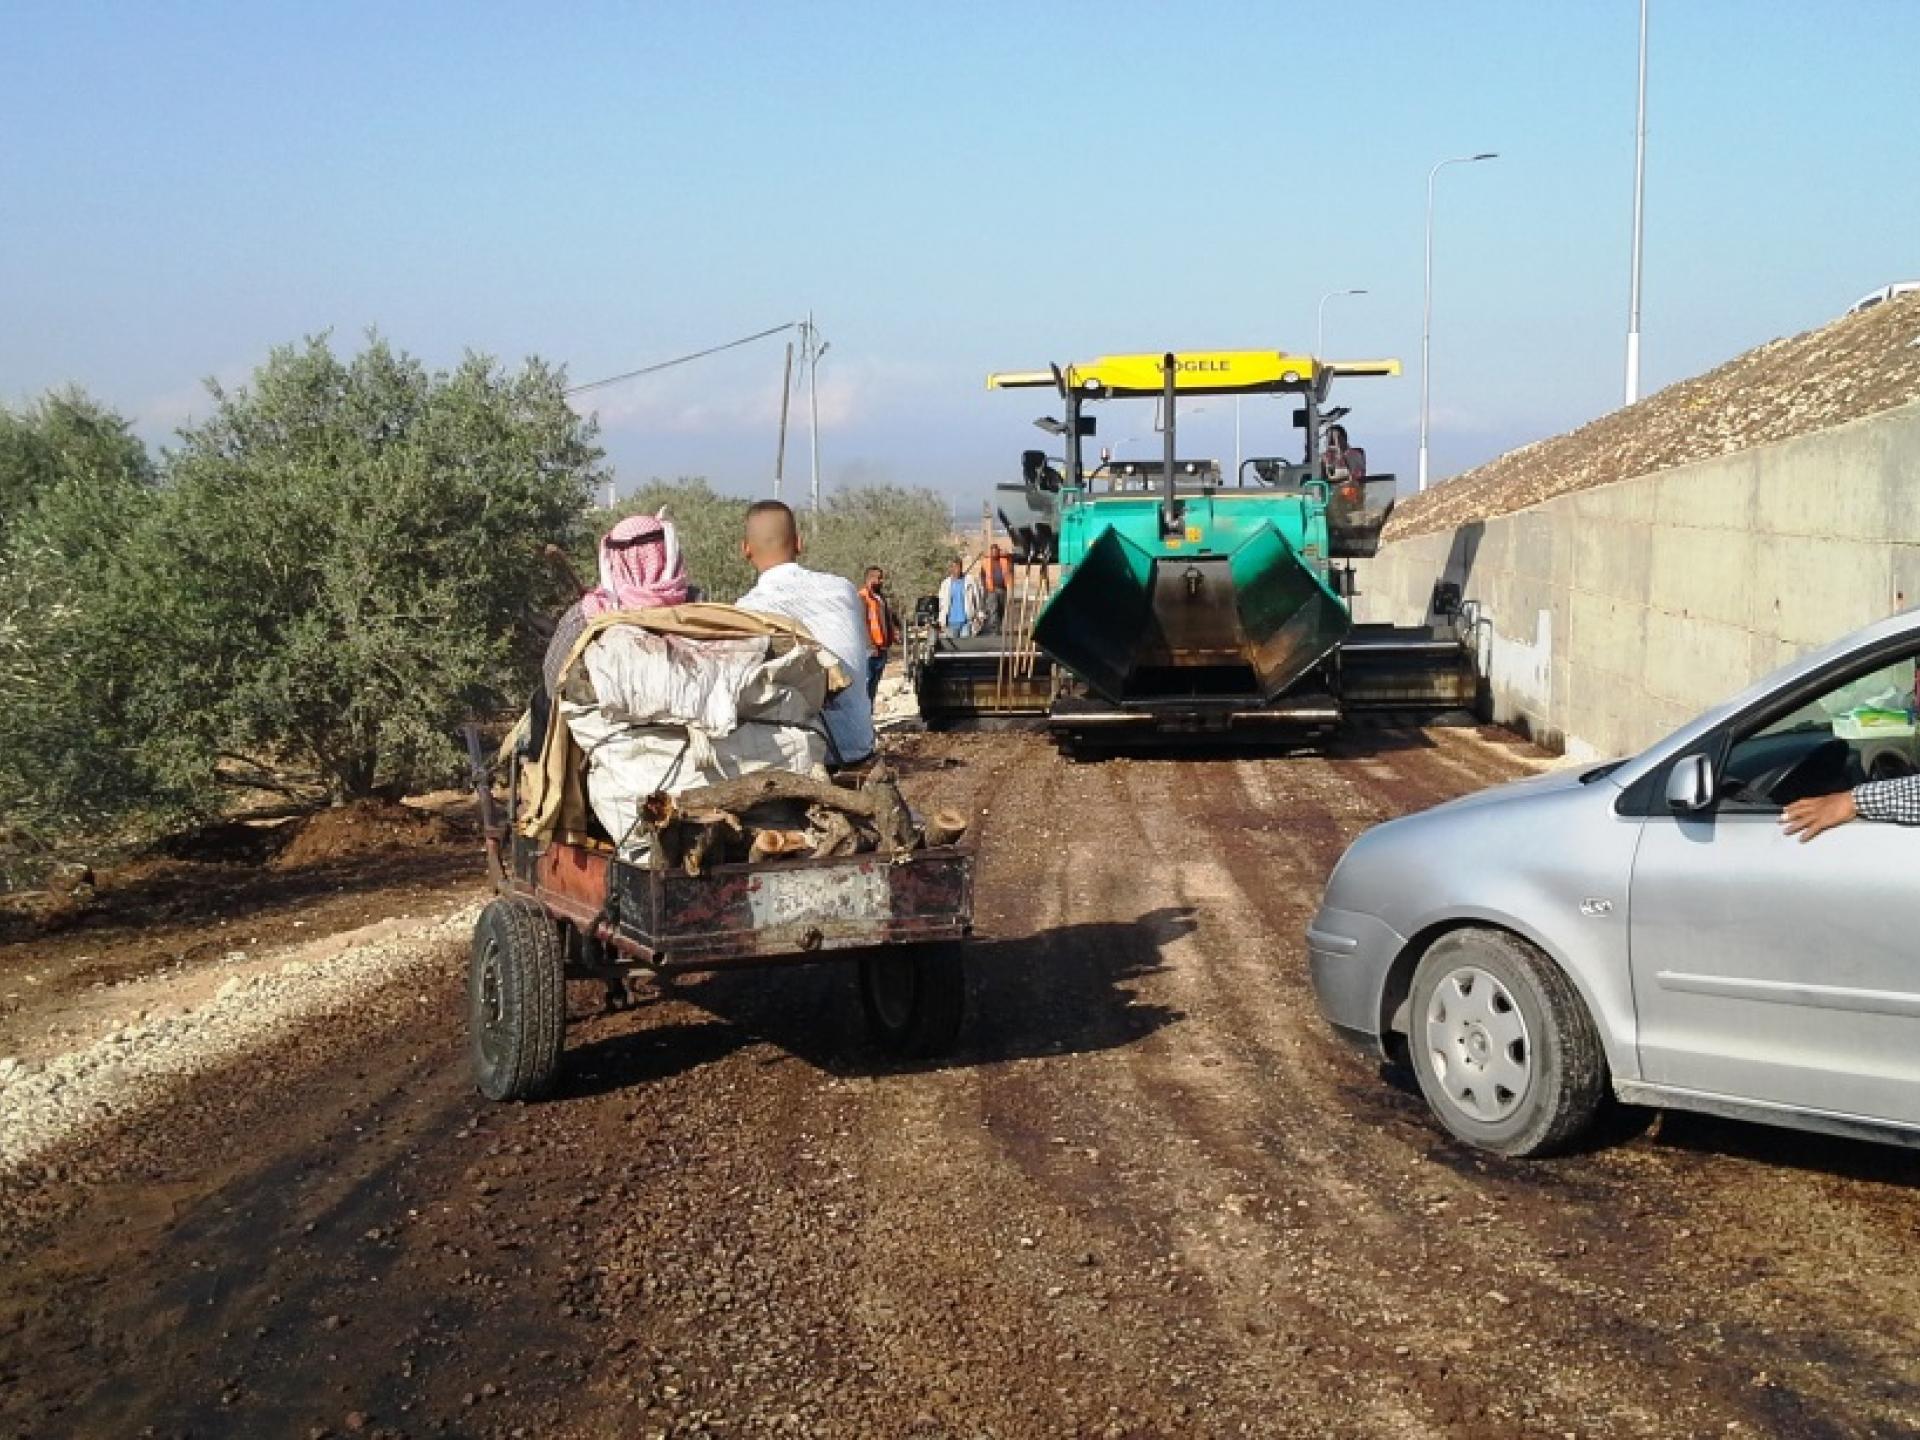 A big tractor making asphalt